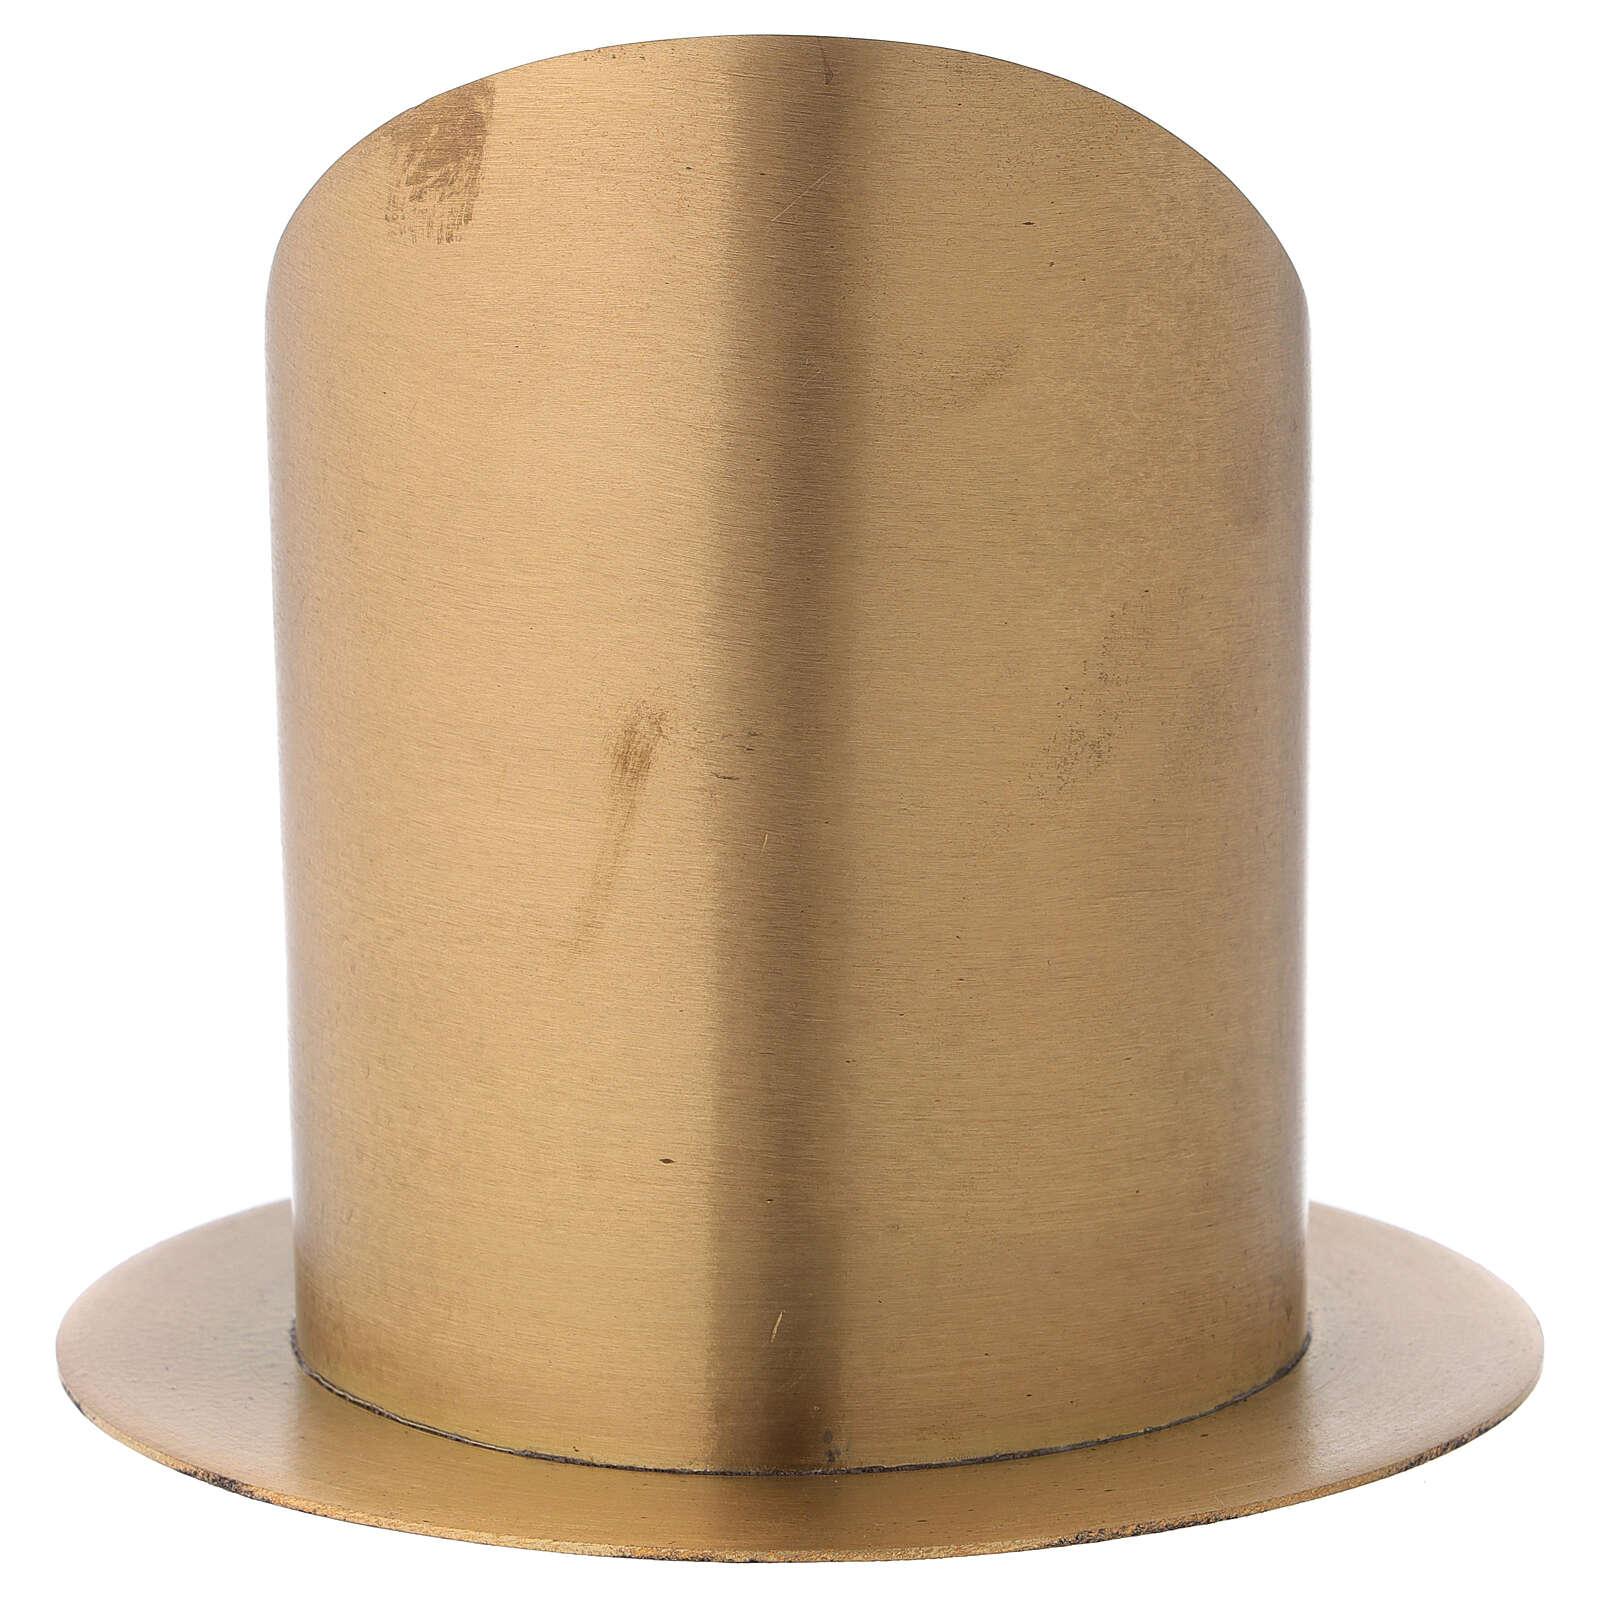 Portacandela taglio obliquo ottone dorato satinato diametro 10 cm 4